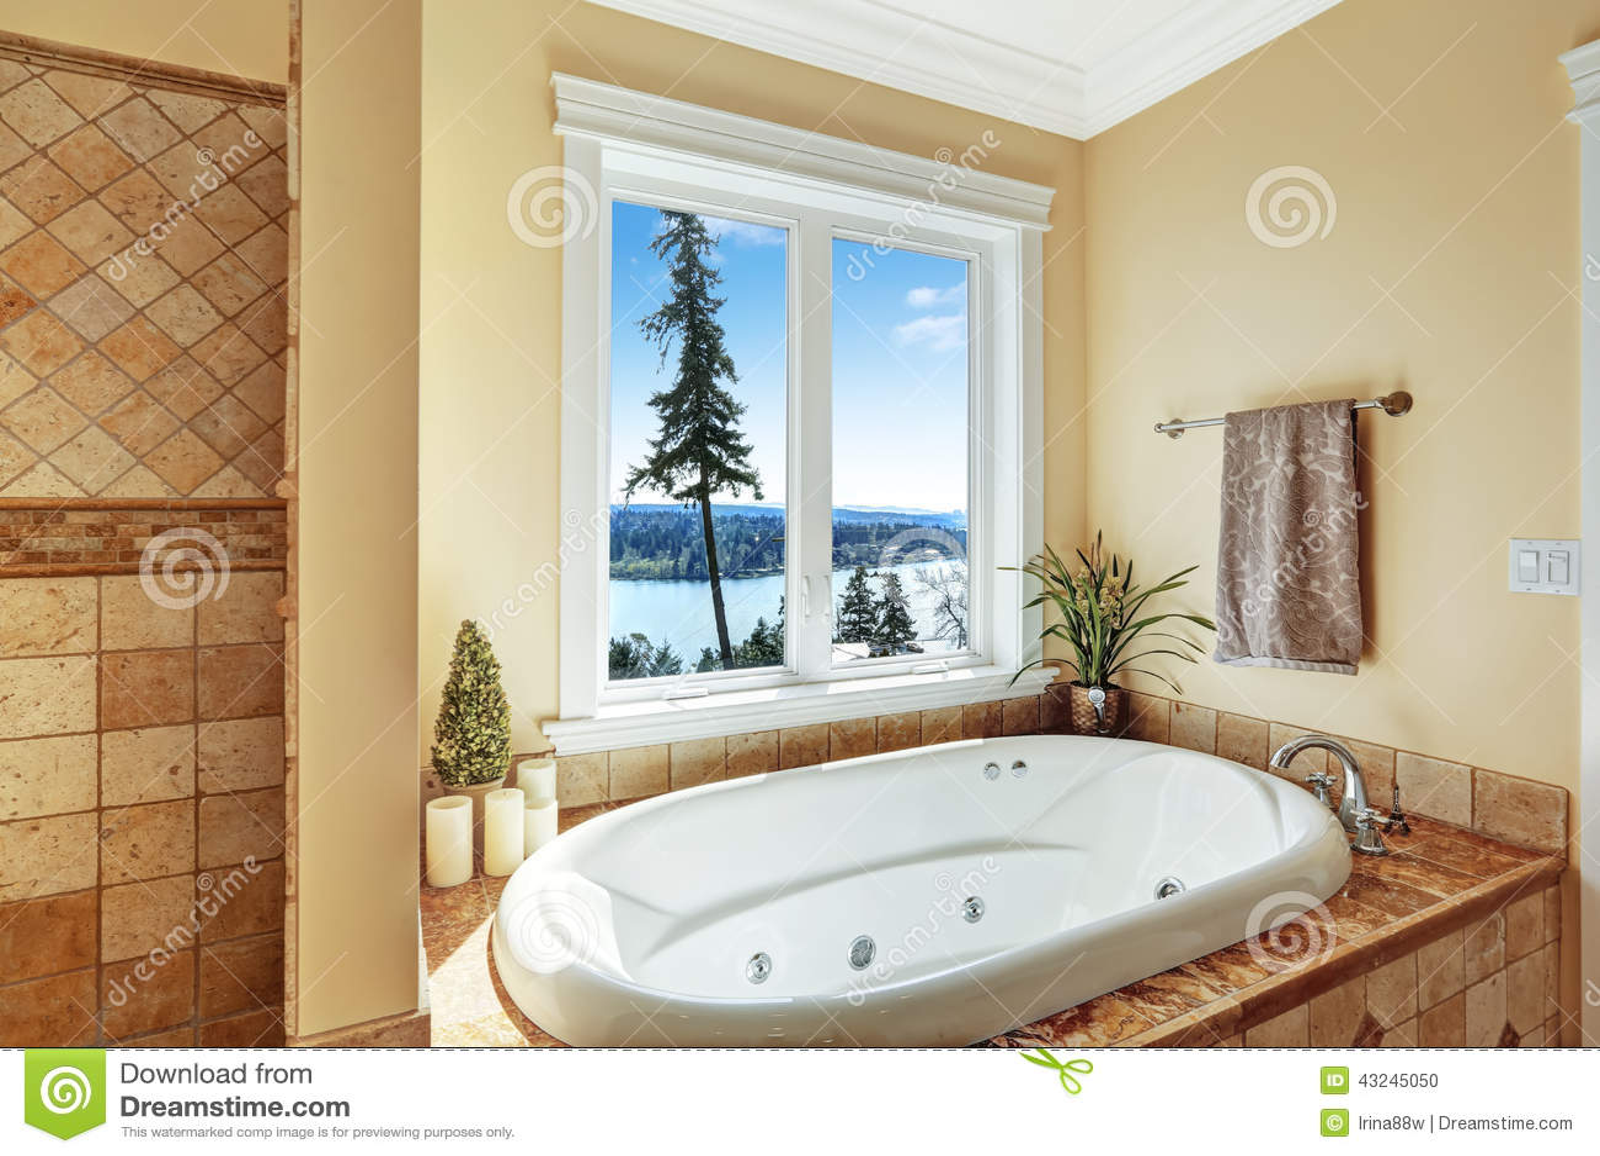 Bathroom With Whirlpool Bath Tub And Beautiful View Stock Photo ...